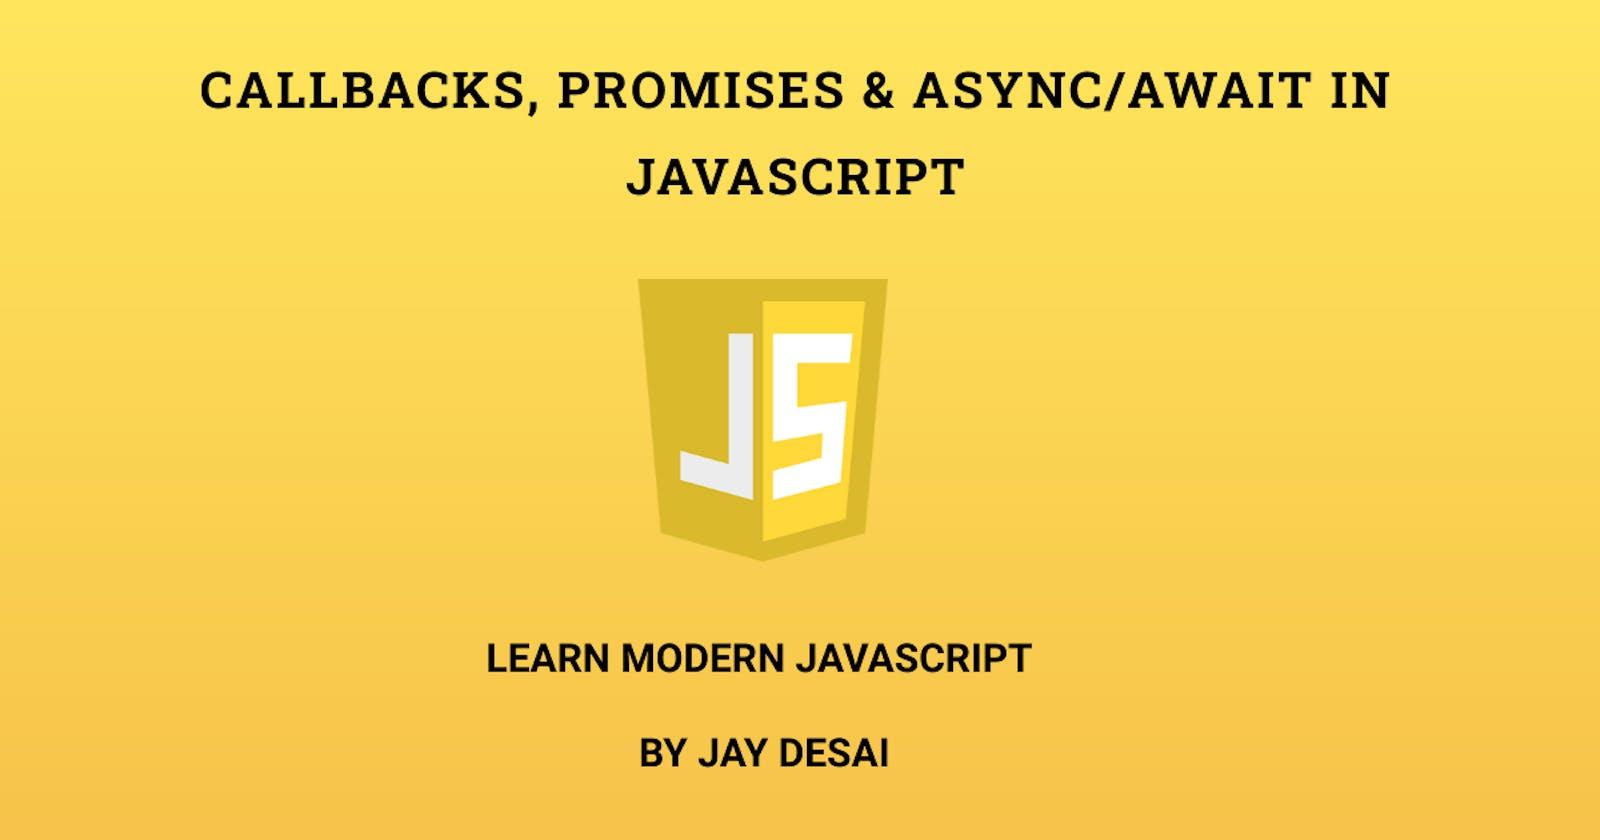 Callbacks, Promises & Async/Await in JavaScript